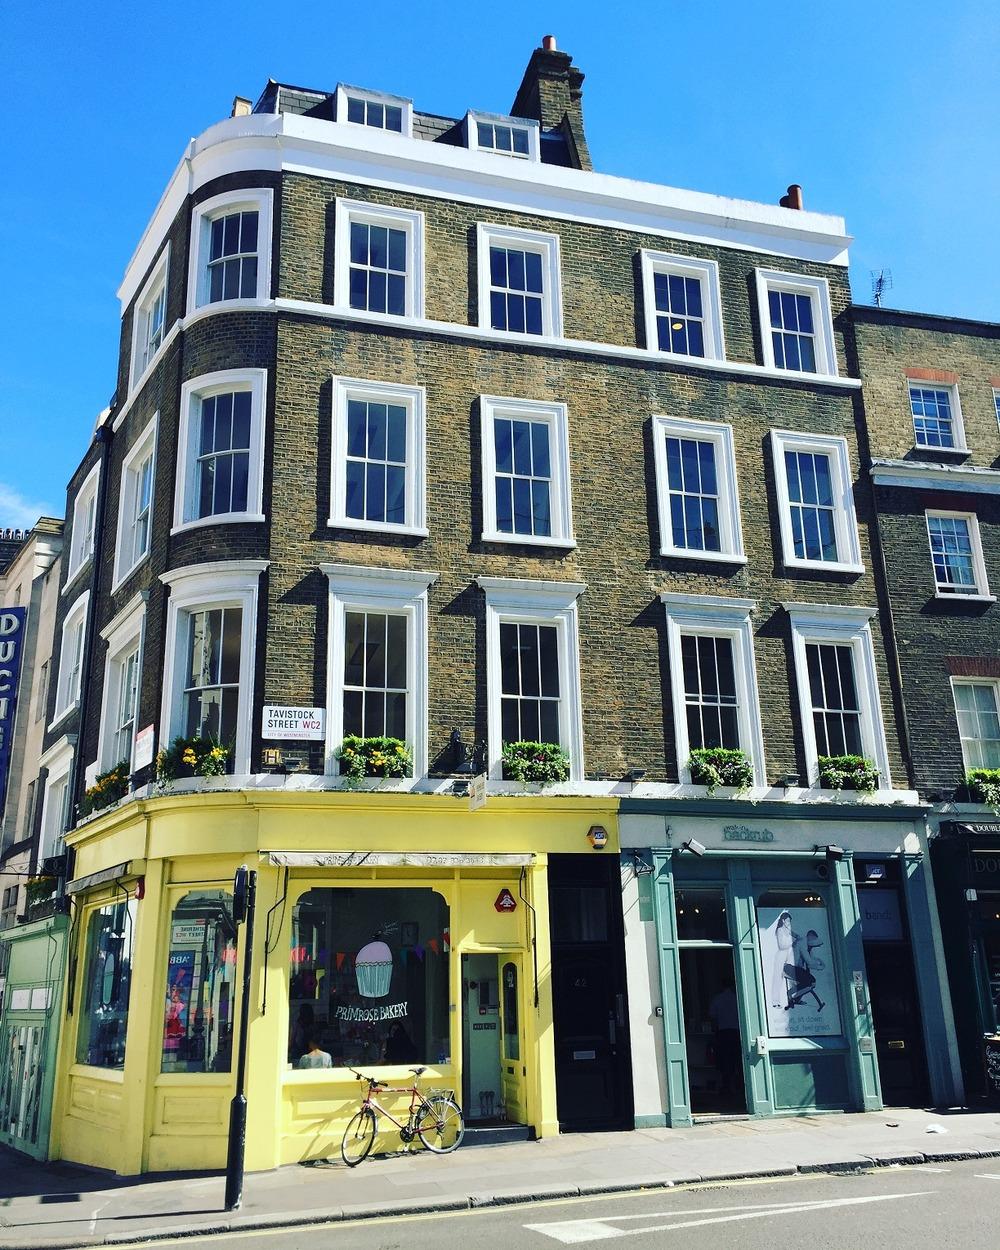 WorkPad - 42 Tavistock Street, WC2 - Covent Garden